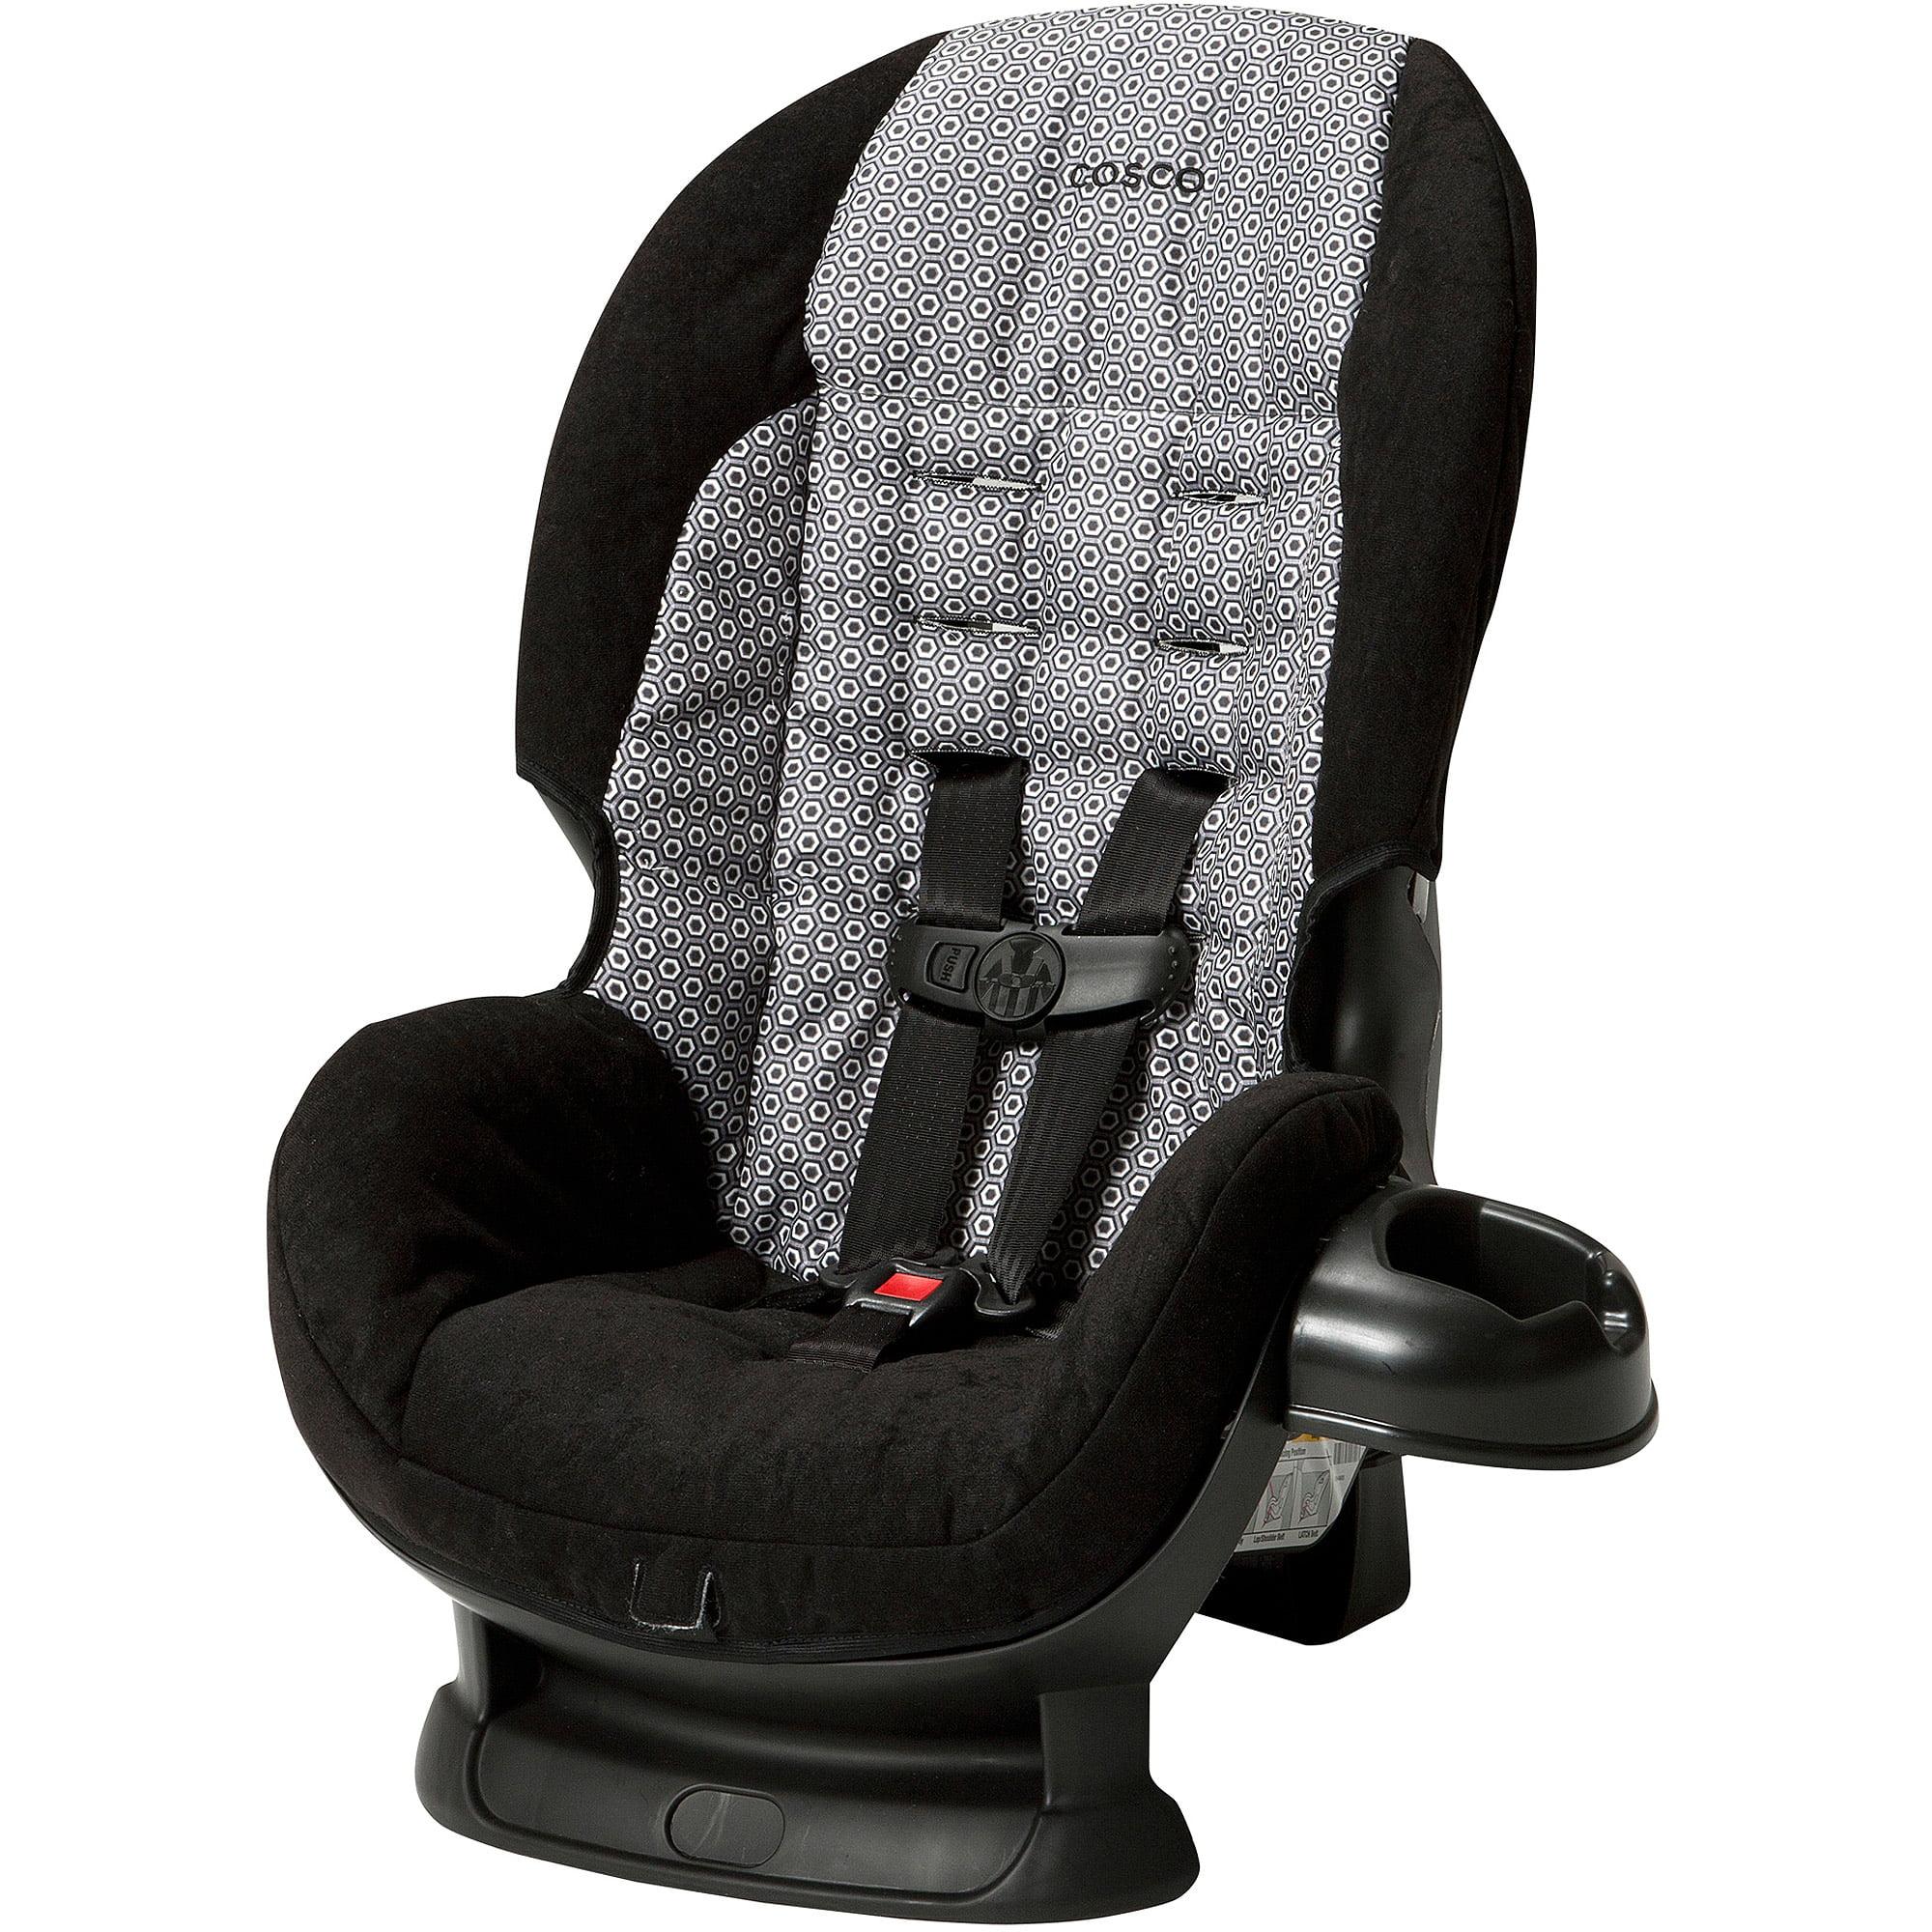 Cosco Scenera Convertible Car Seat Instructions